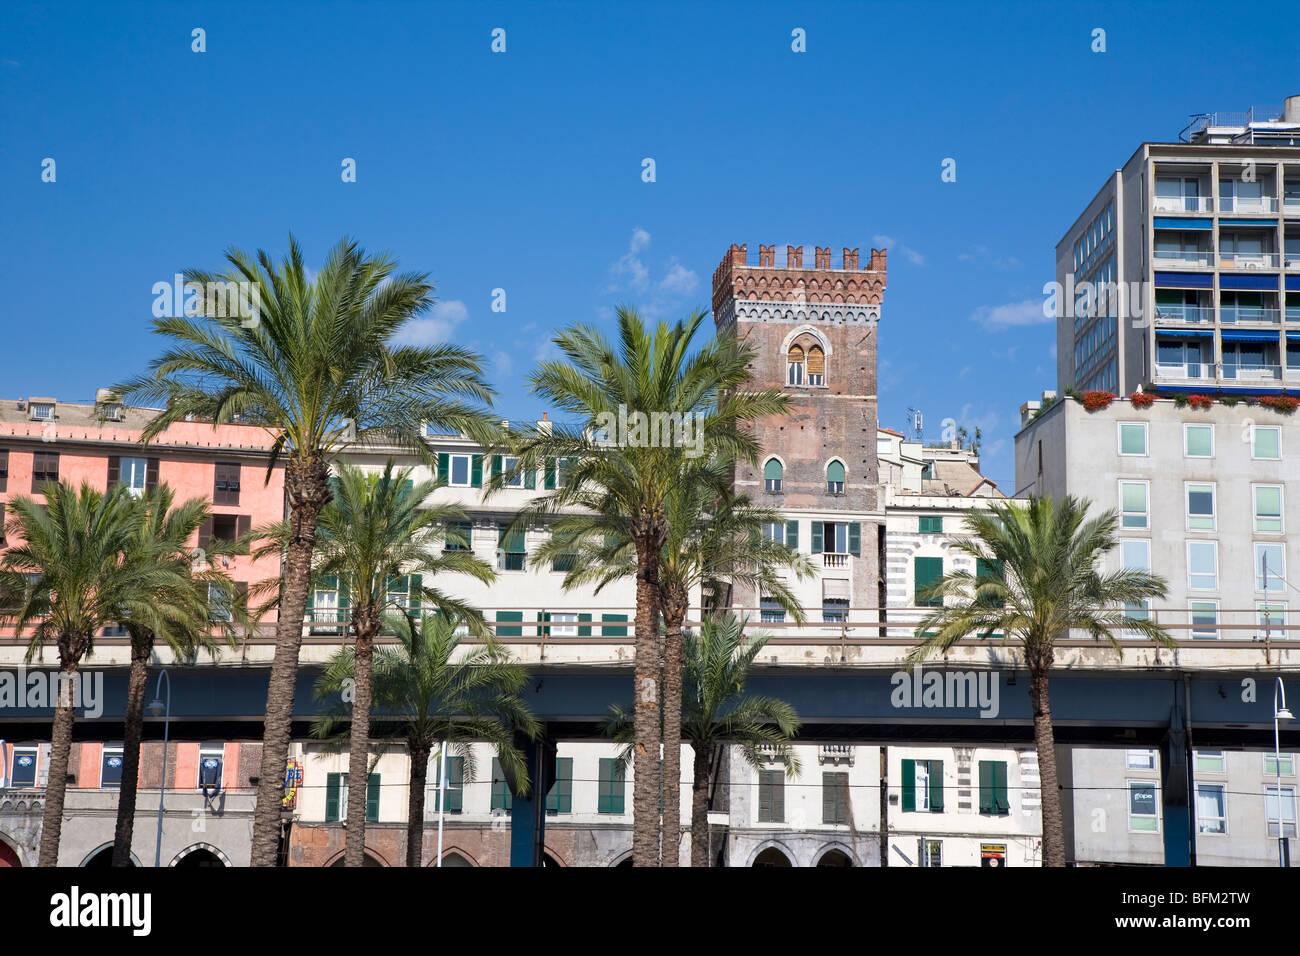 Raised flyover road in Genoa, Italy - Stock Image